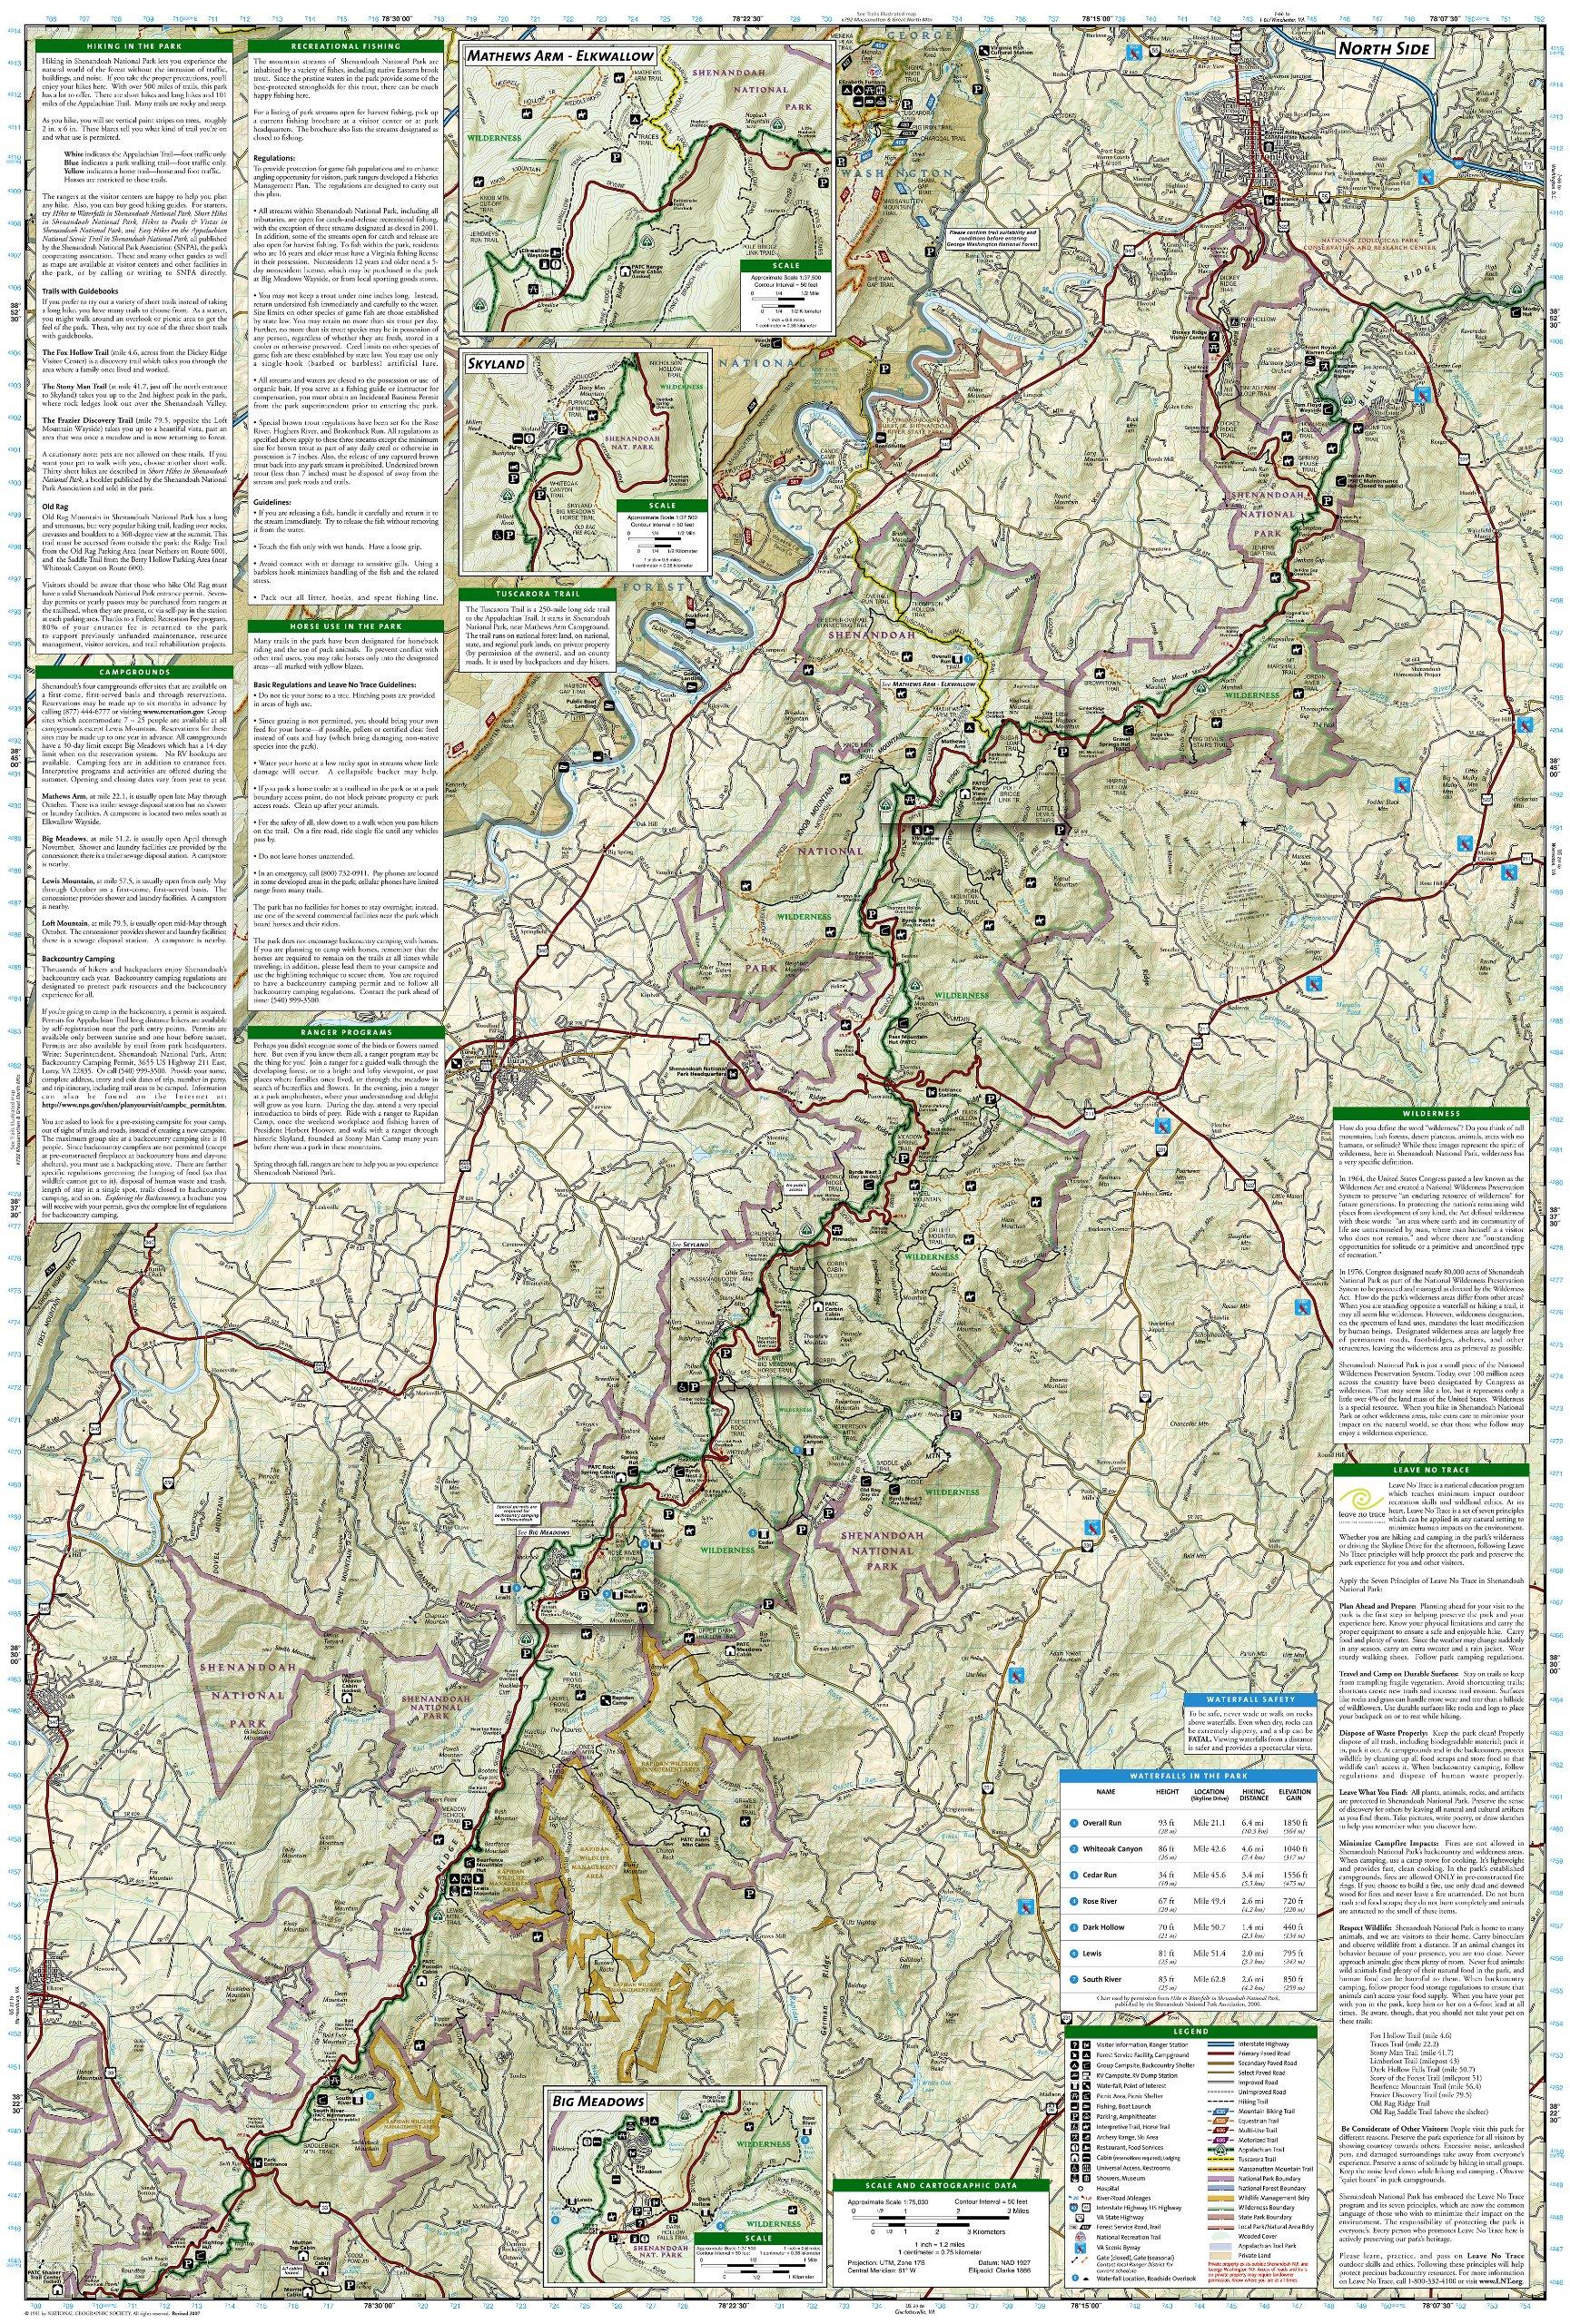 shenandoah national park (national geographic trails illustrated map)national geographic maps  trails illustrated  amazoncombooks. shenandoah national park (national geographic trails illustrated